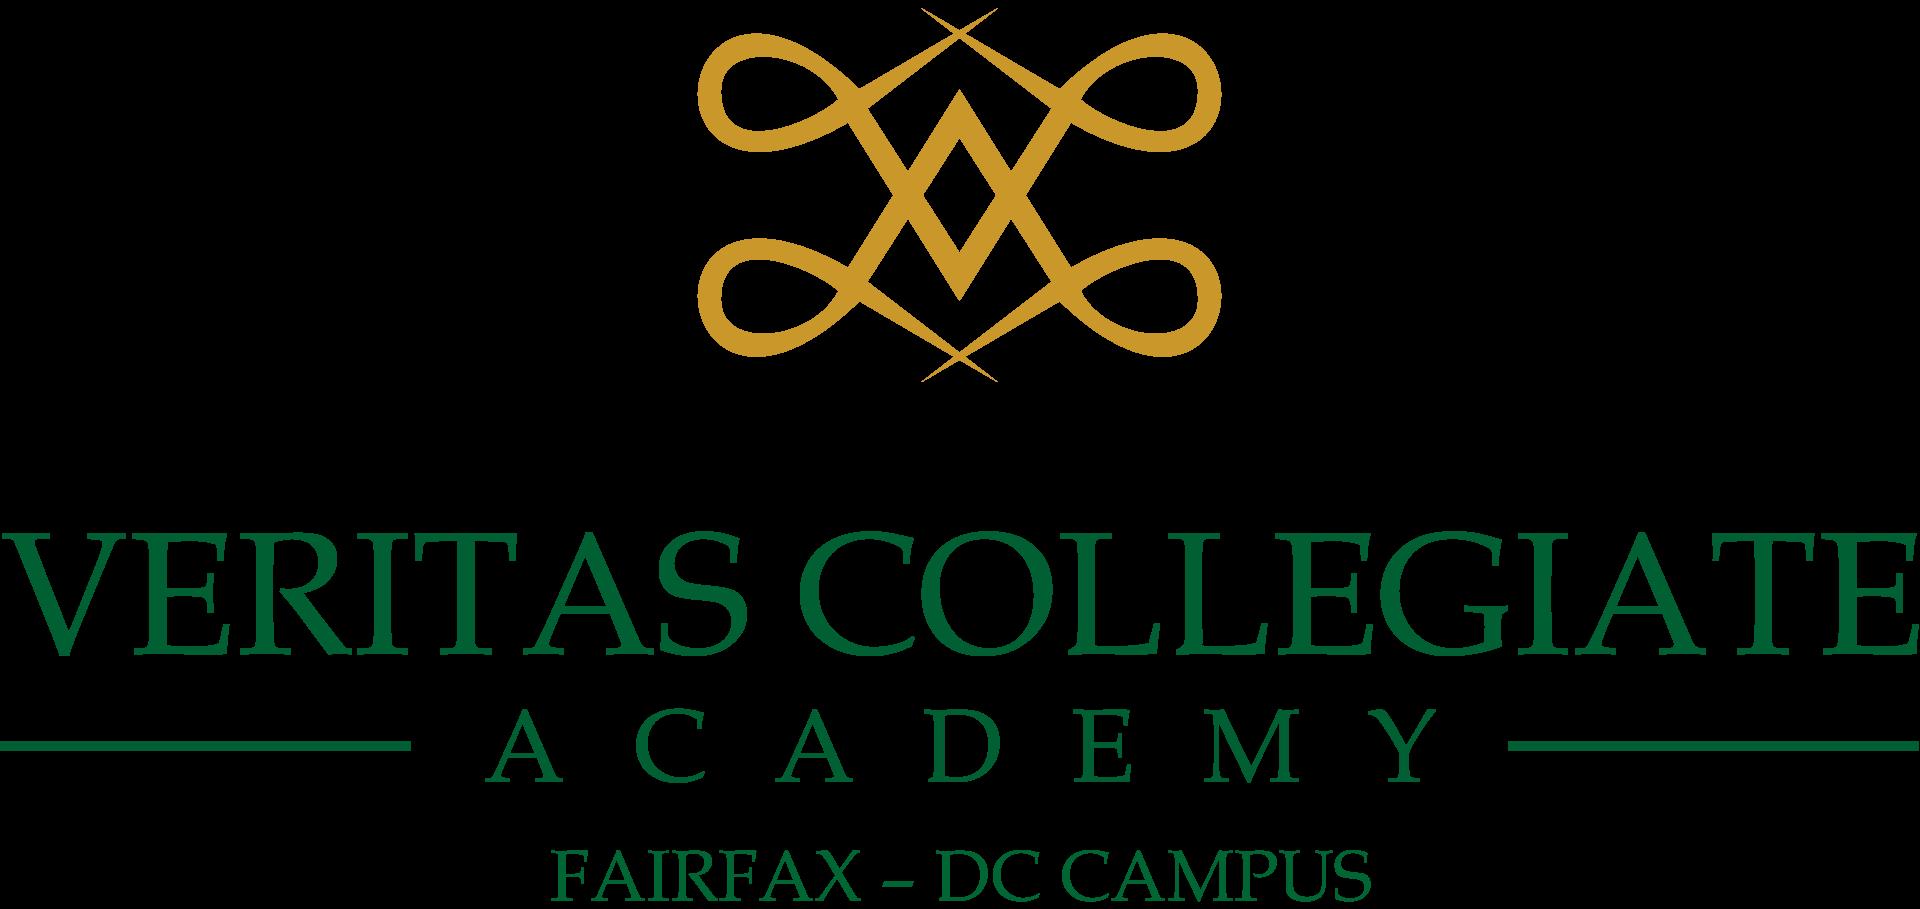 VCA DC Logo 1 PNG.png